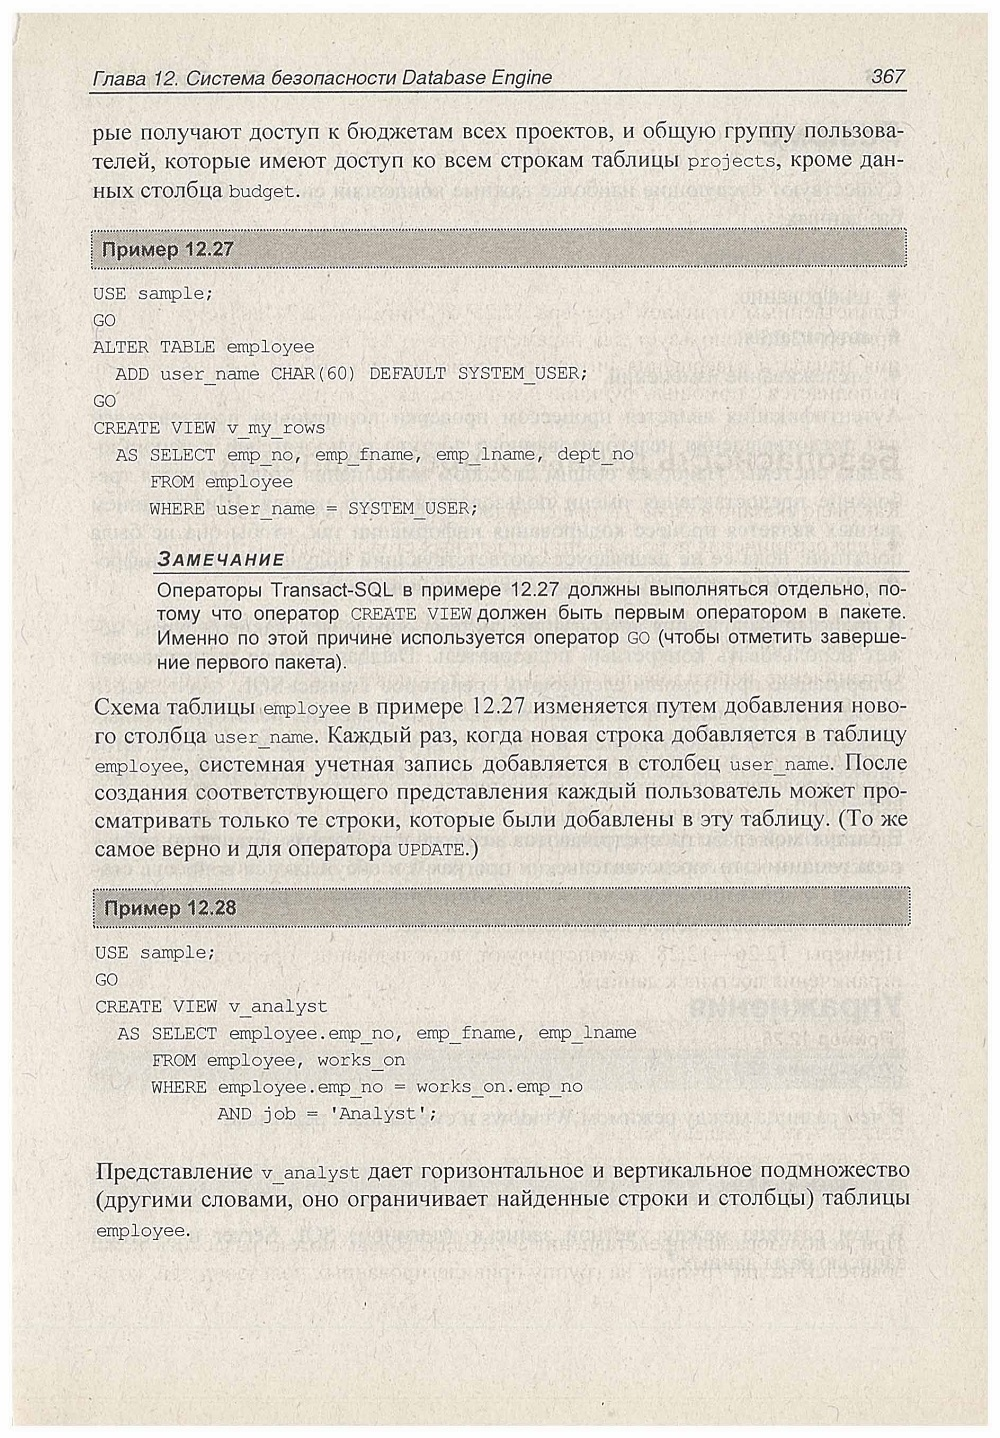 http://i3.imageban.ru/out/2014/01/20/e166b43221bb73fdc7a6e12c08b271b7.jpg